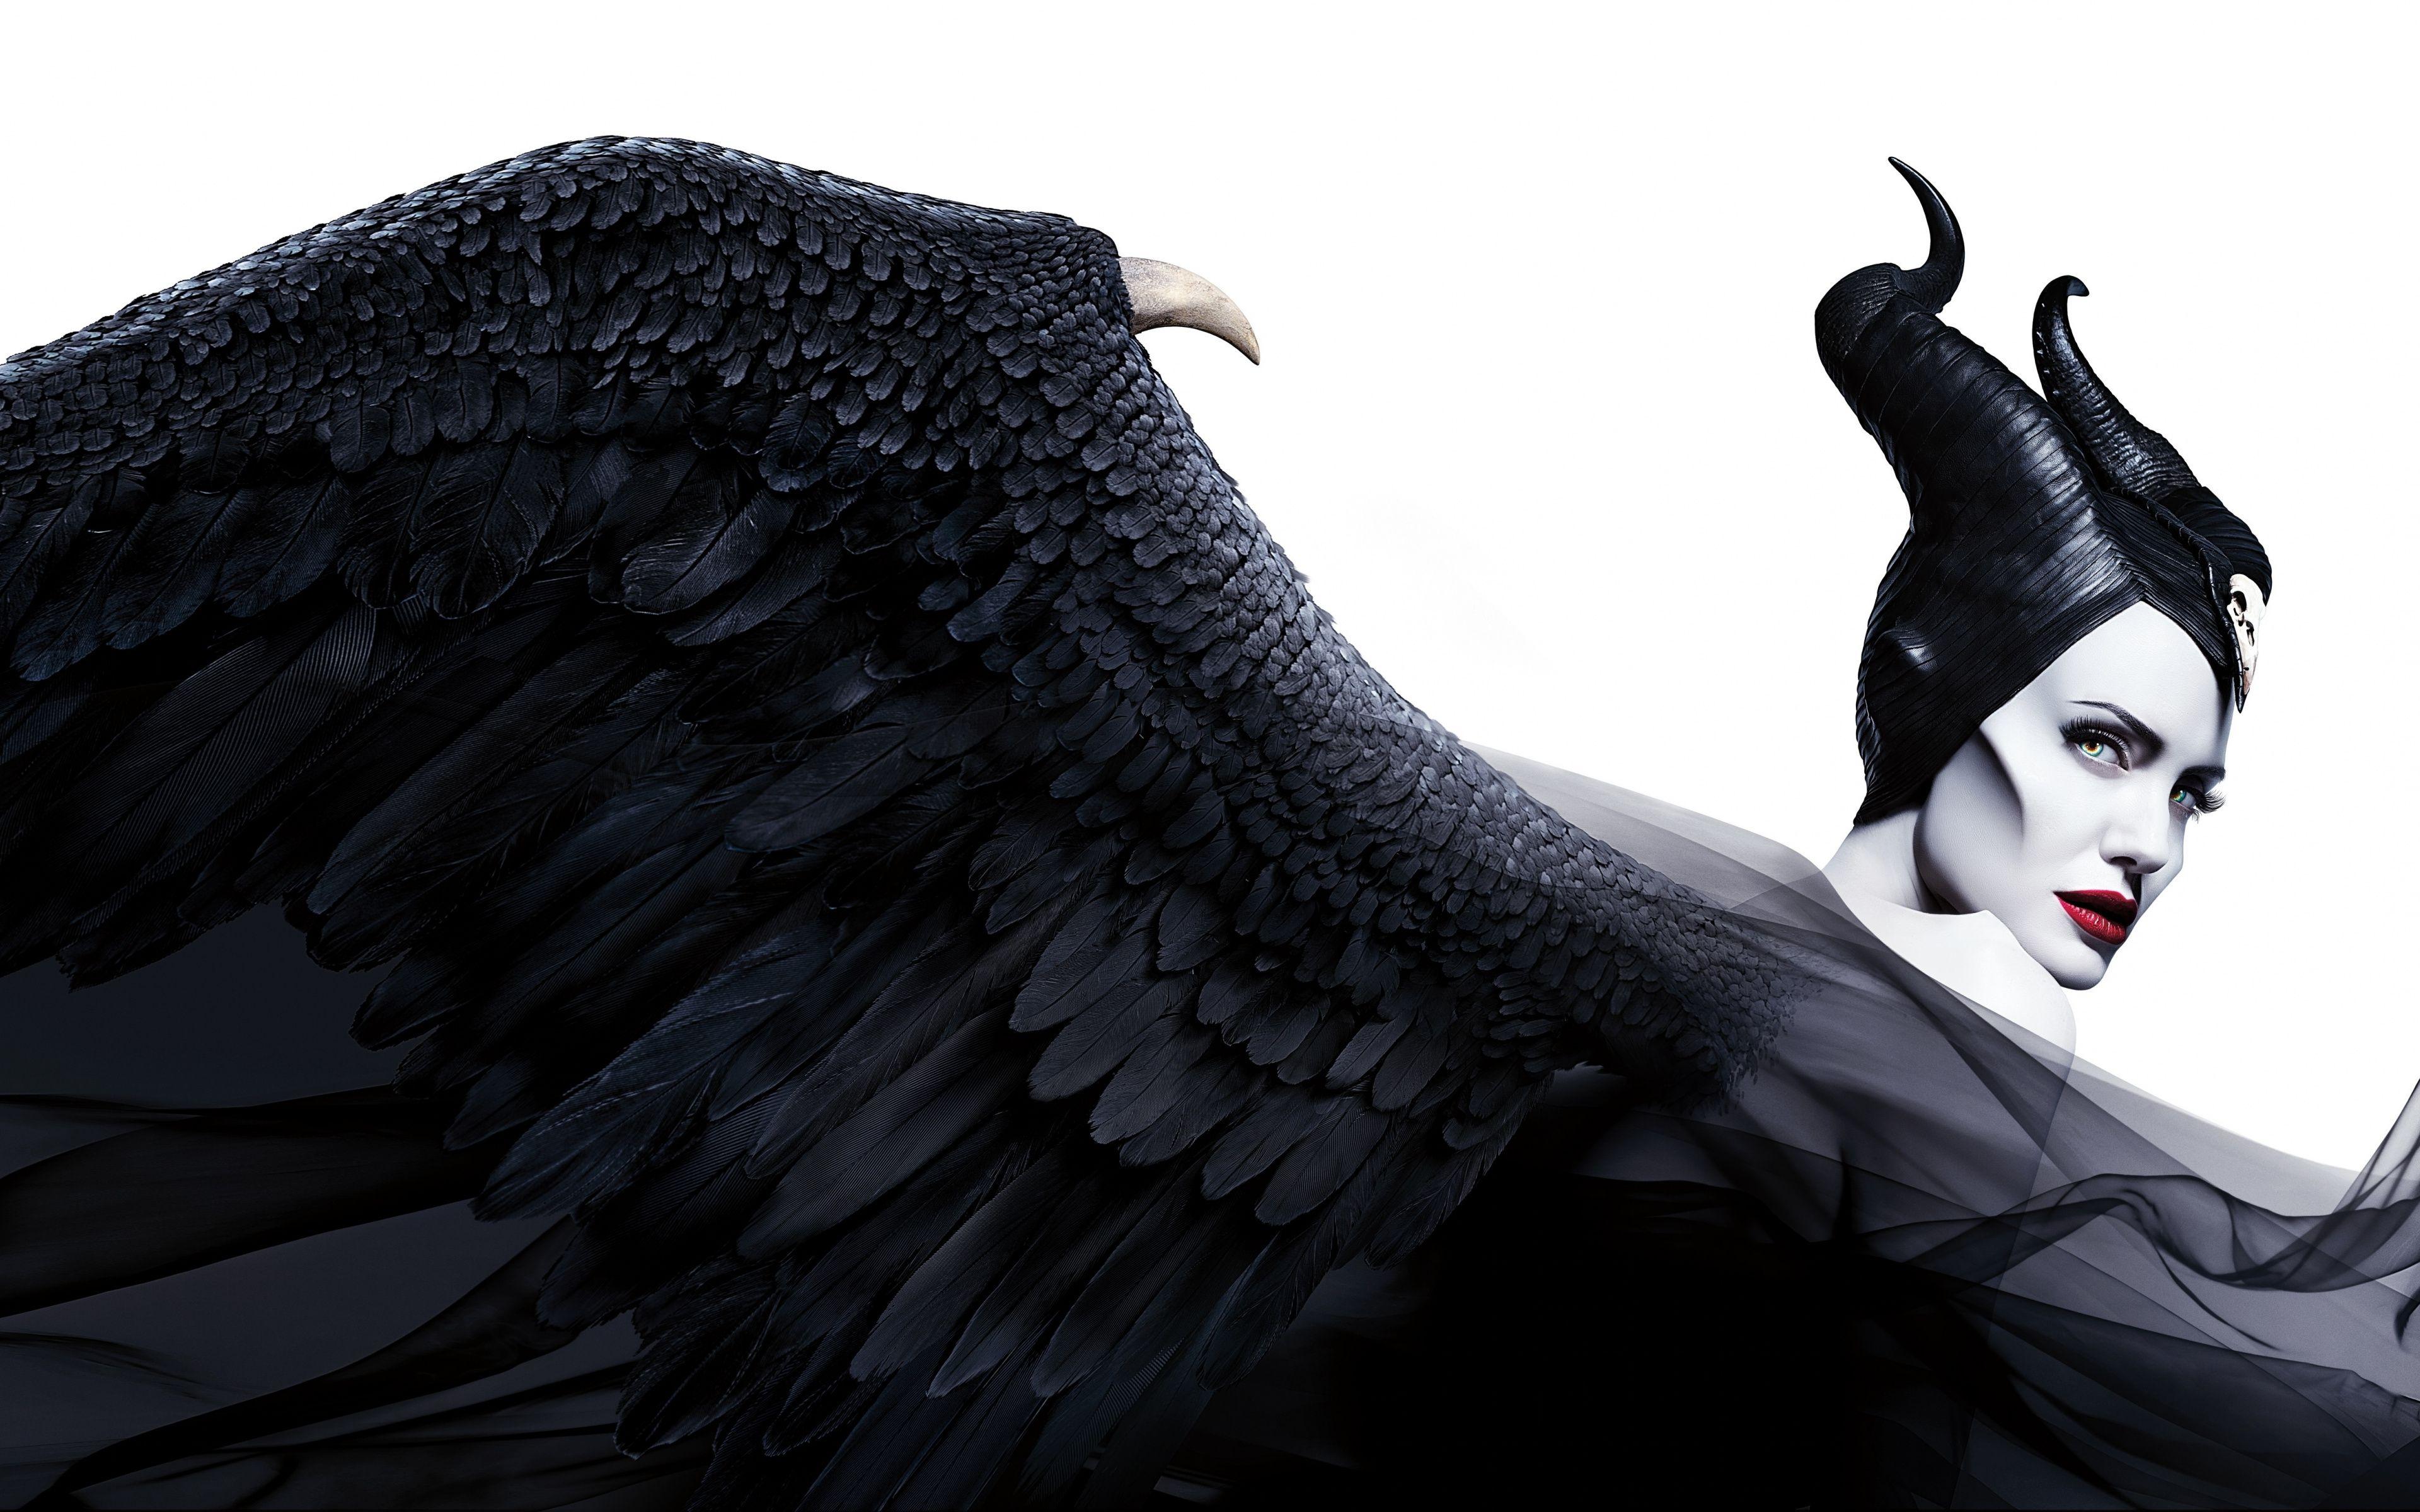 3840x2400 Witch Big Wings Maleficent Mistress Of Evil Angelina Jolie 2019 Movie Wallpaper Angelina Jolie Maleficent Maleficent Maleficent Cosplay